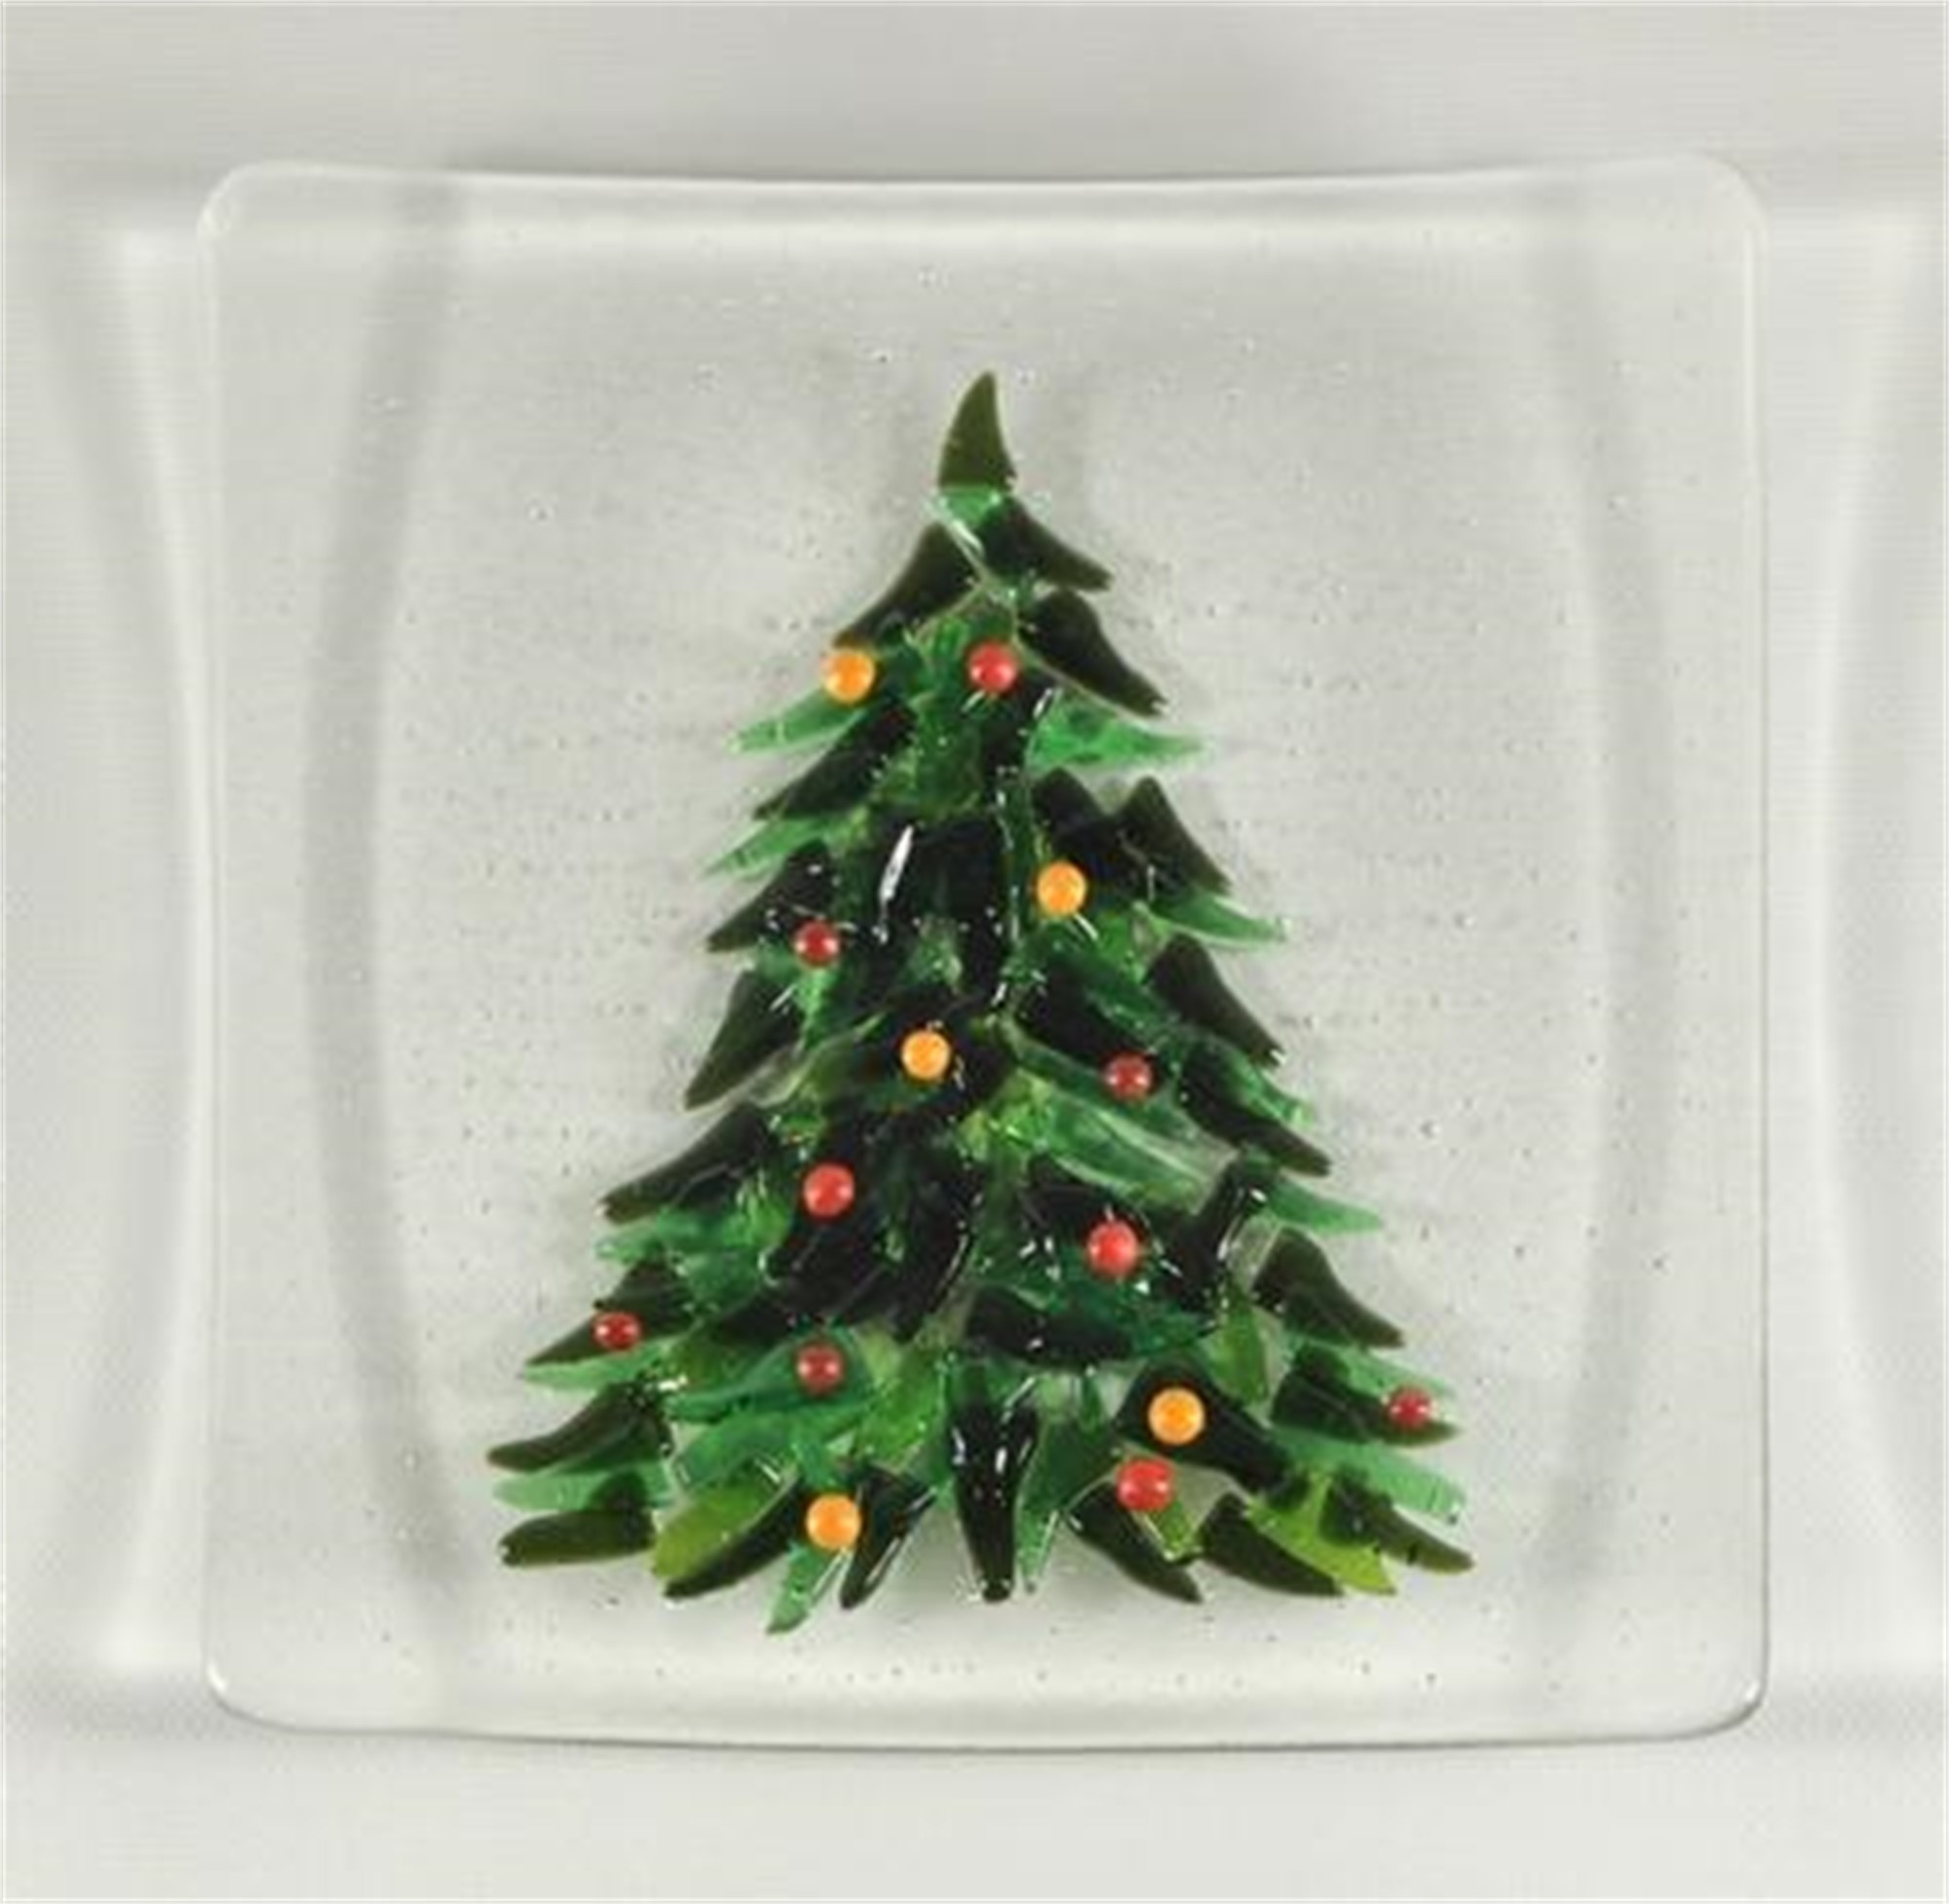 Christmas Tree Plate by Greg Rawls